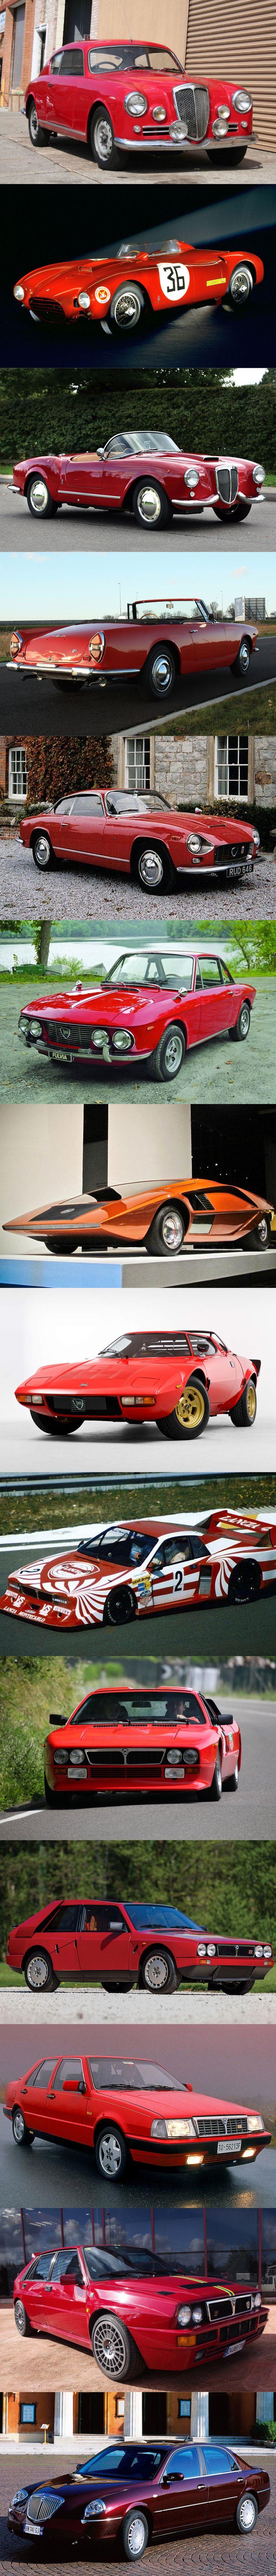 ea7c9289e8db143fb6f368d96e195e77 Astounding Lamborghini Countach Built In Basement Cars Trend